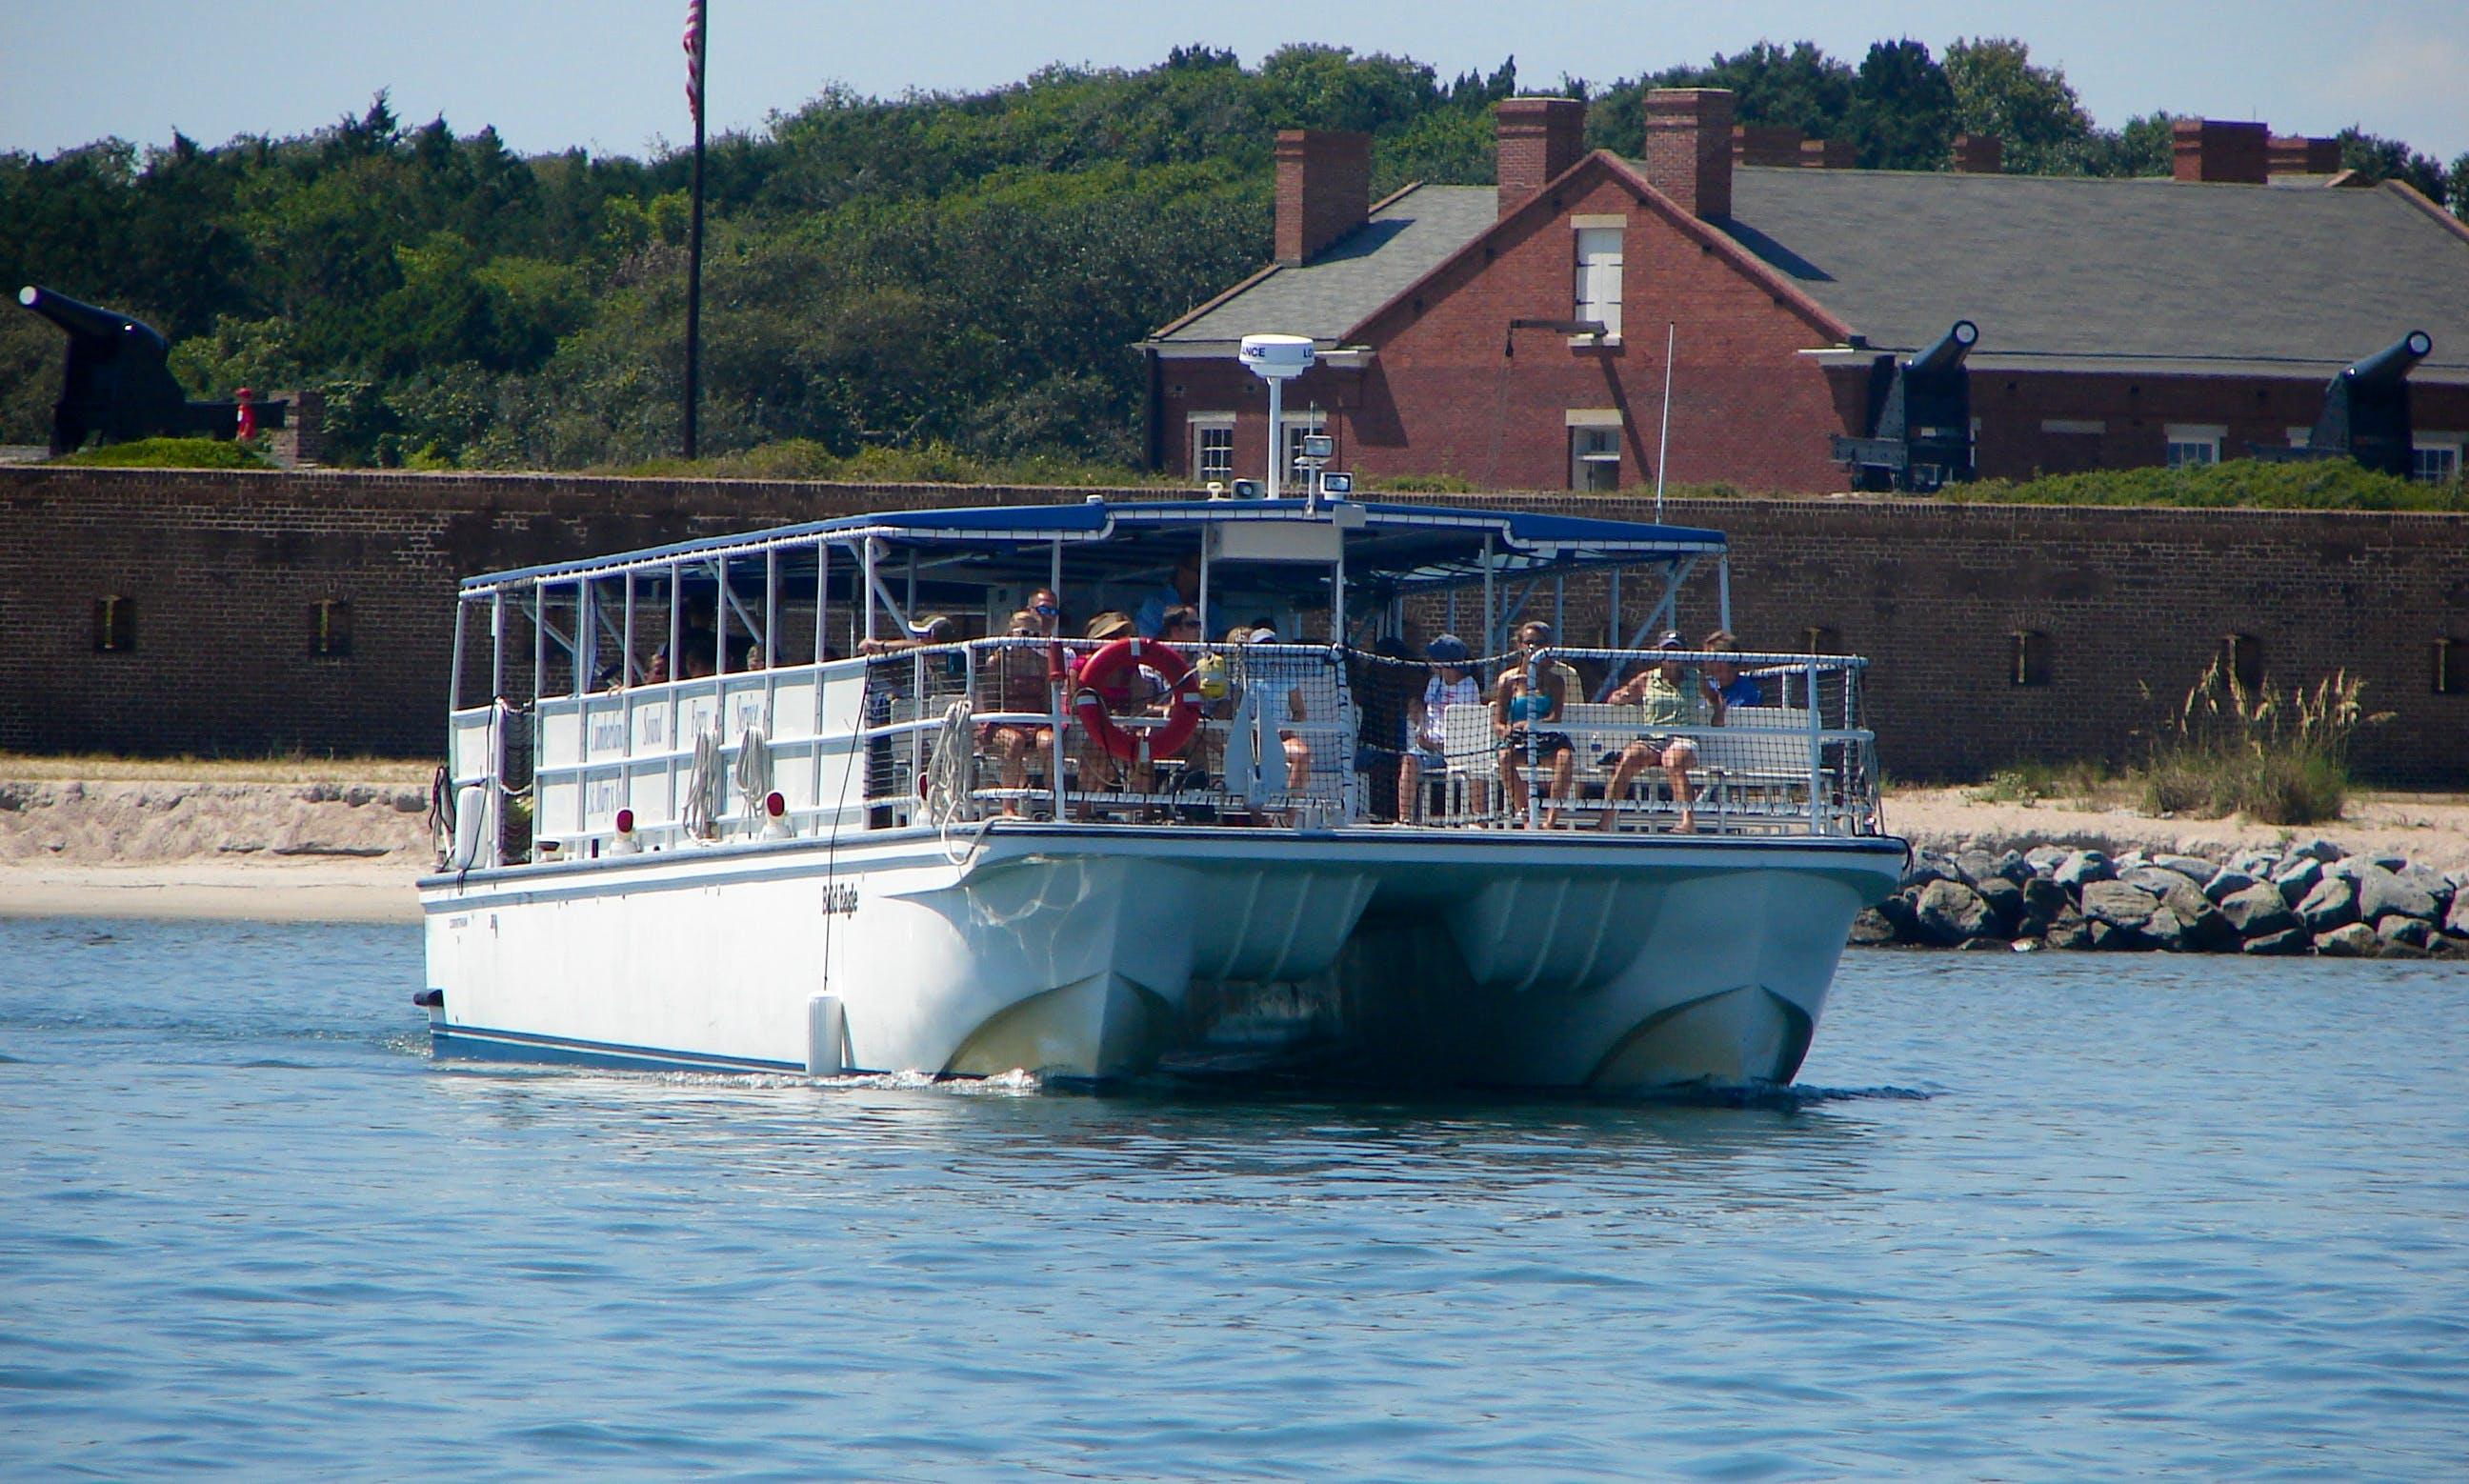 59ft Pontoon Boat Rental in Fernandina Beach, Florida